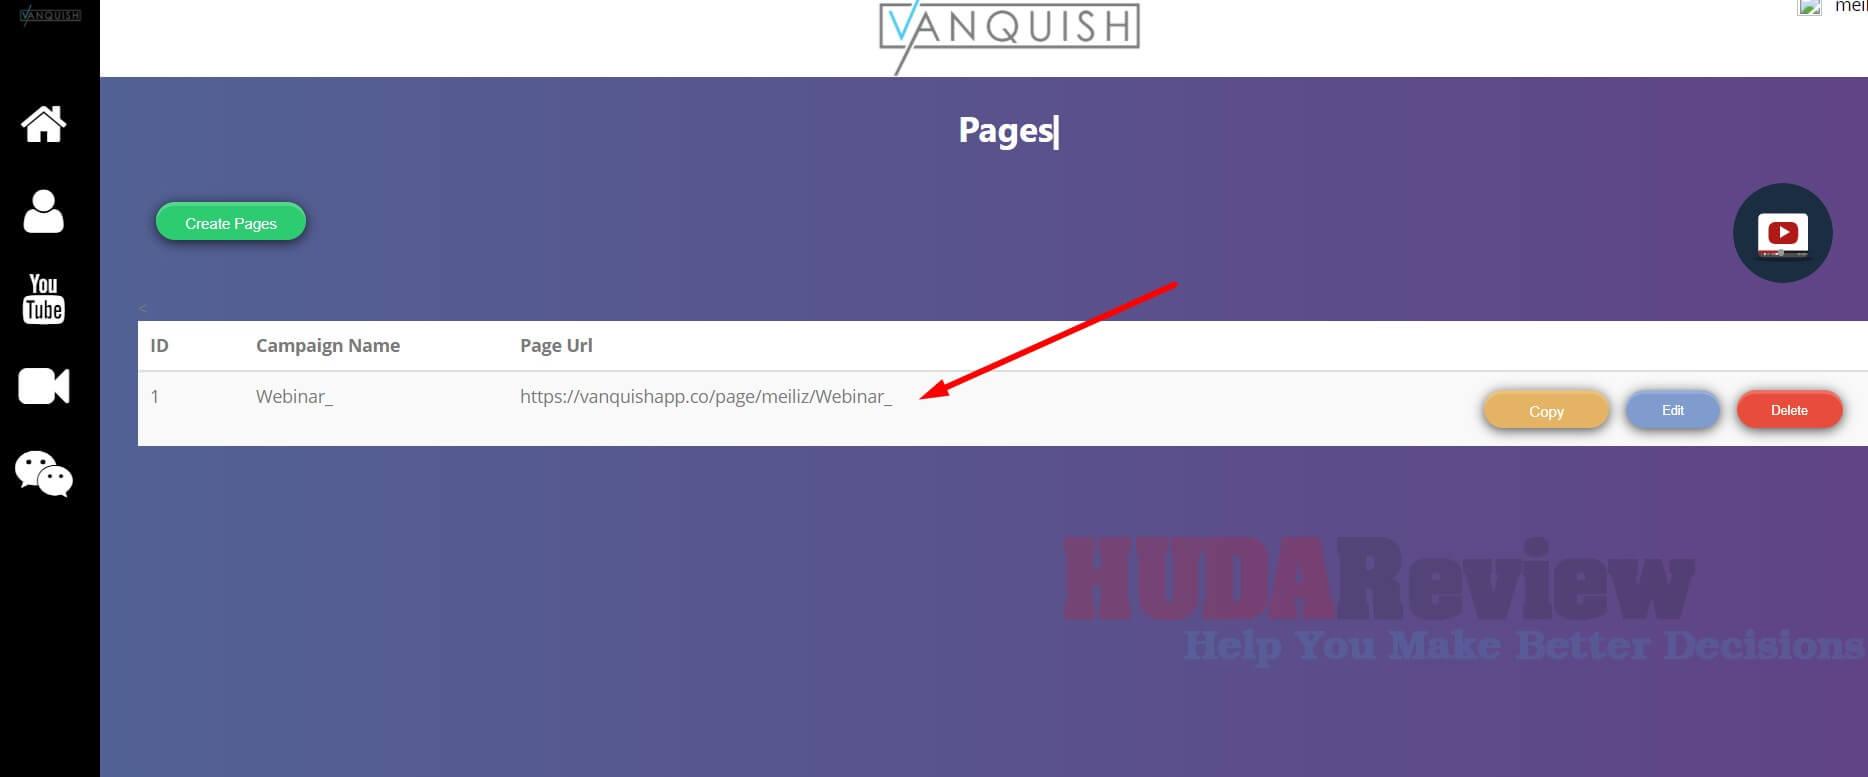 Vanquish-Step-3-1